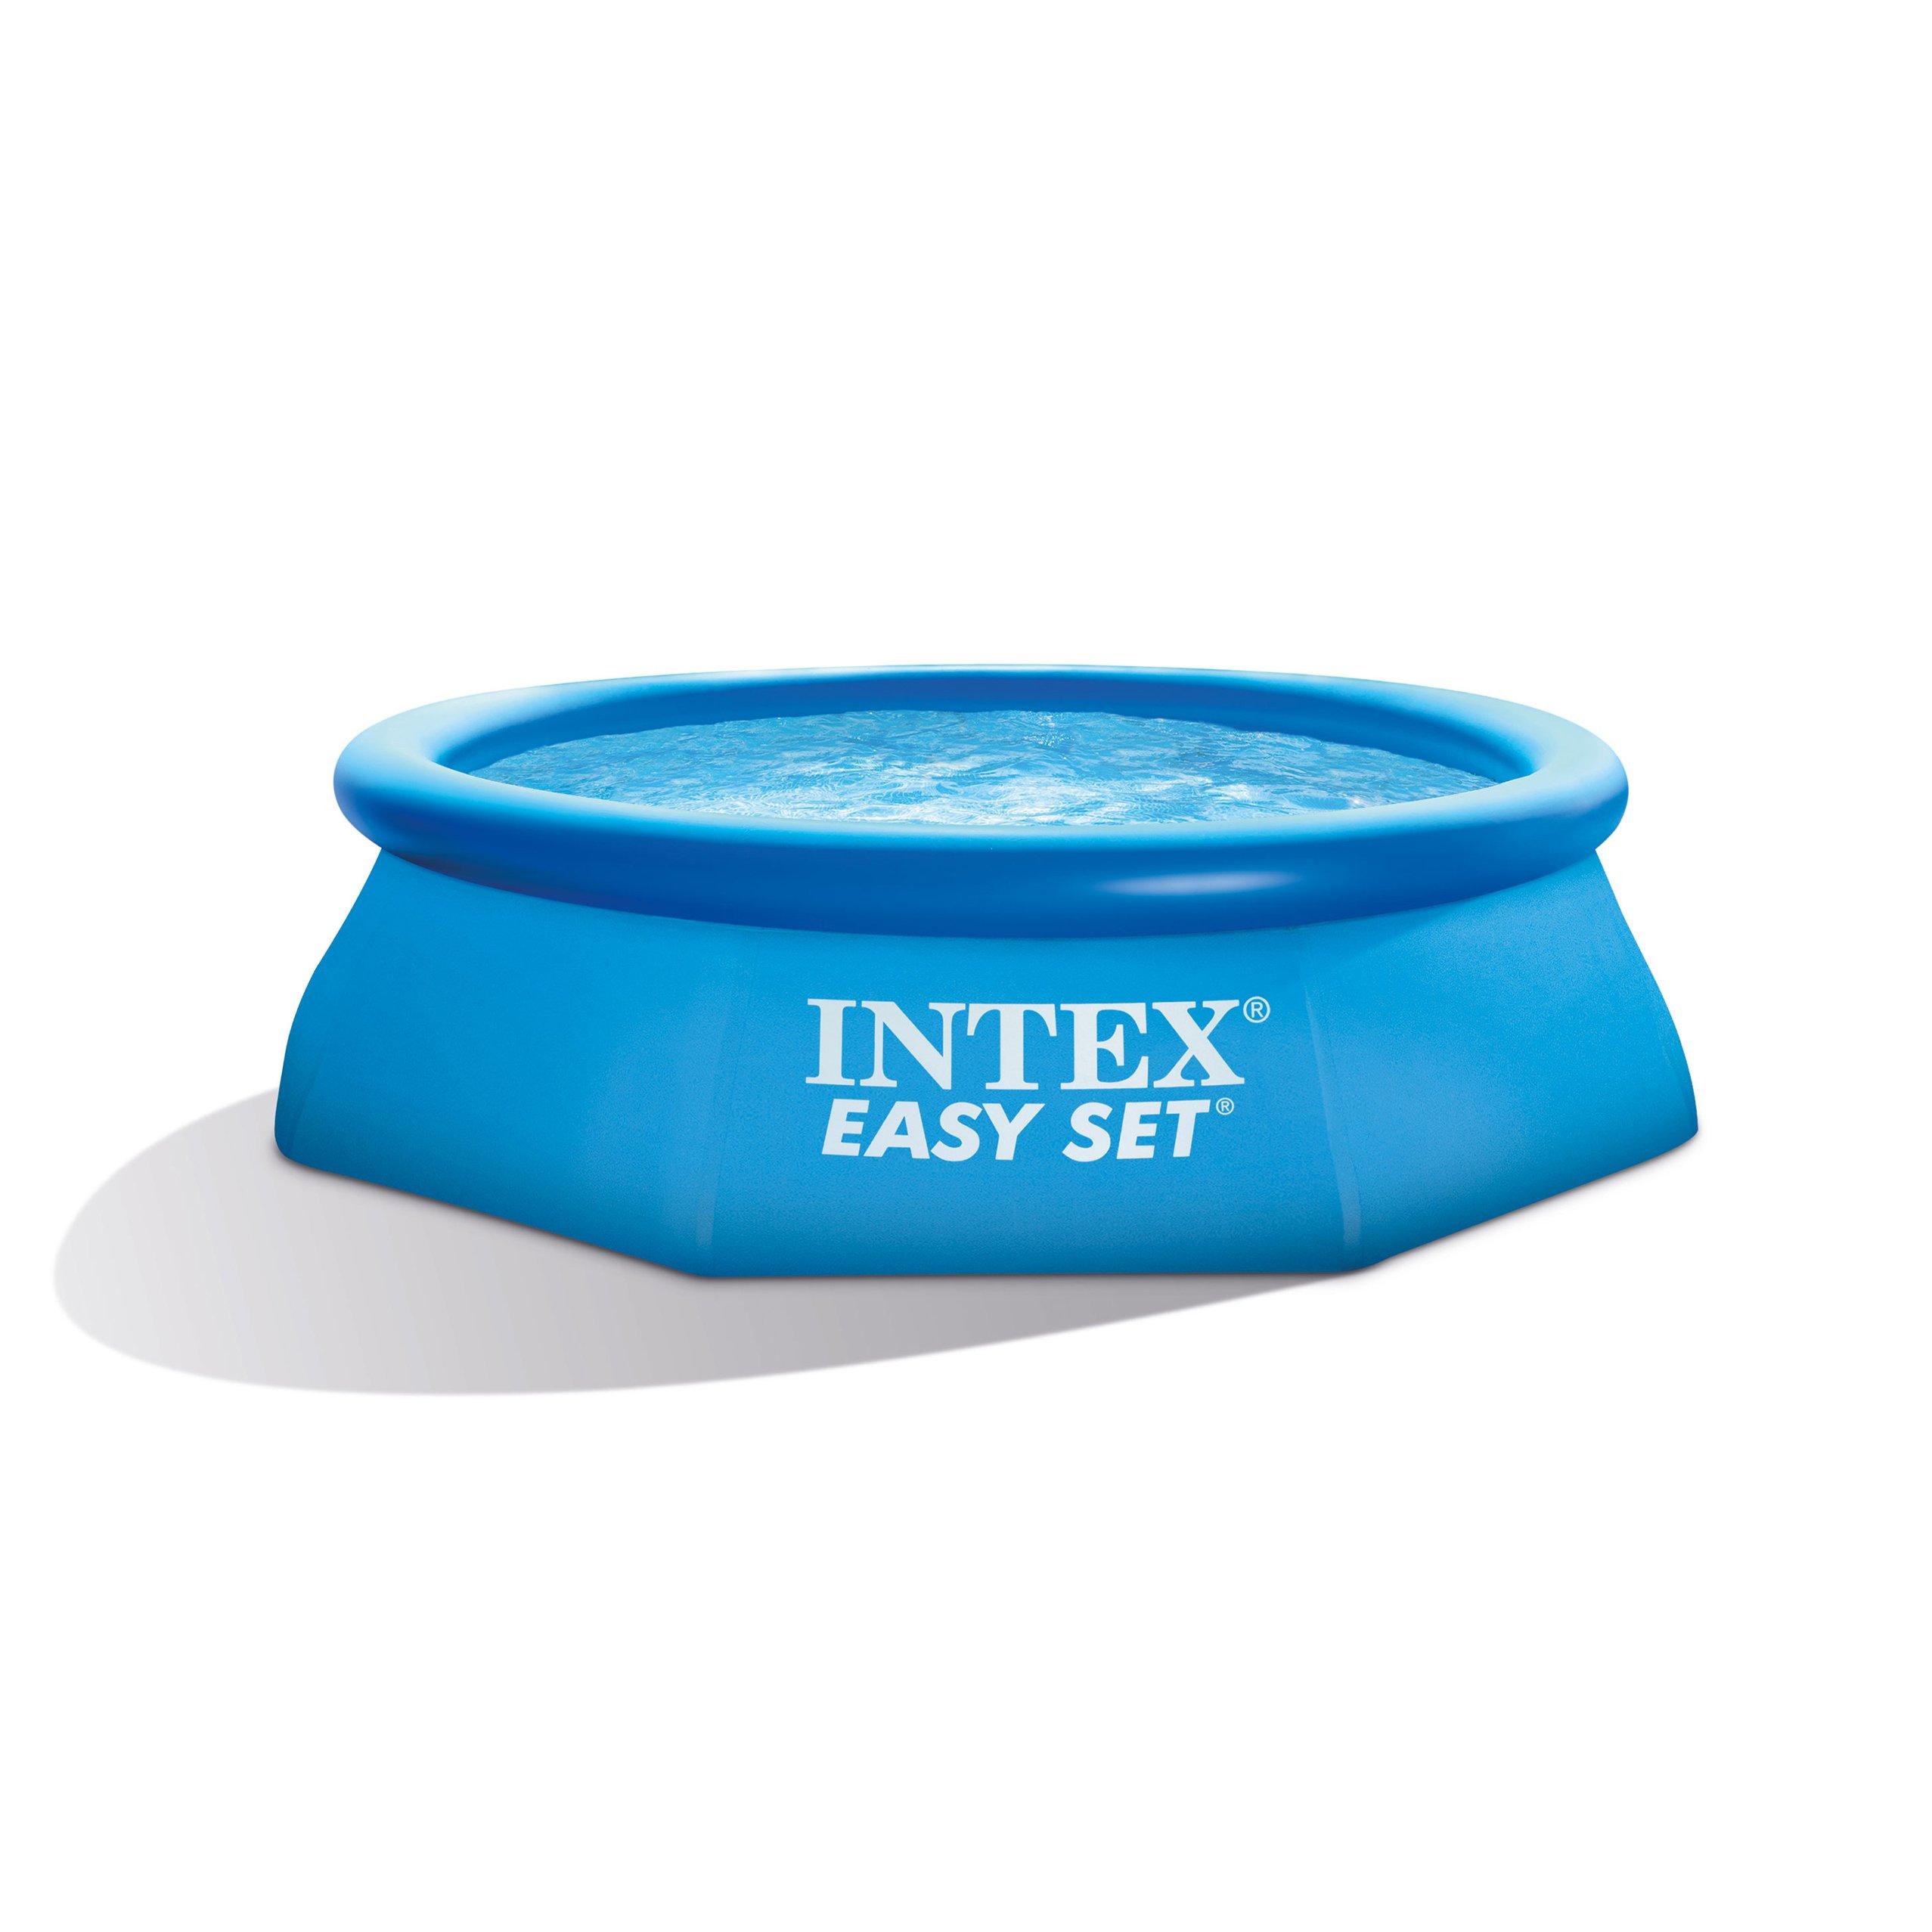 Details about Intex 8\' x 30\